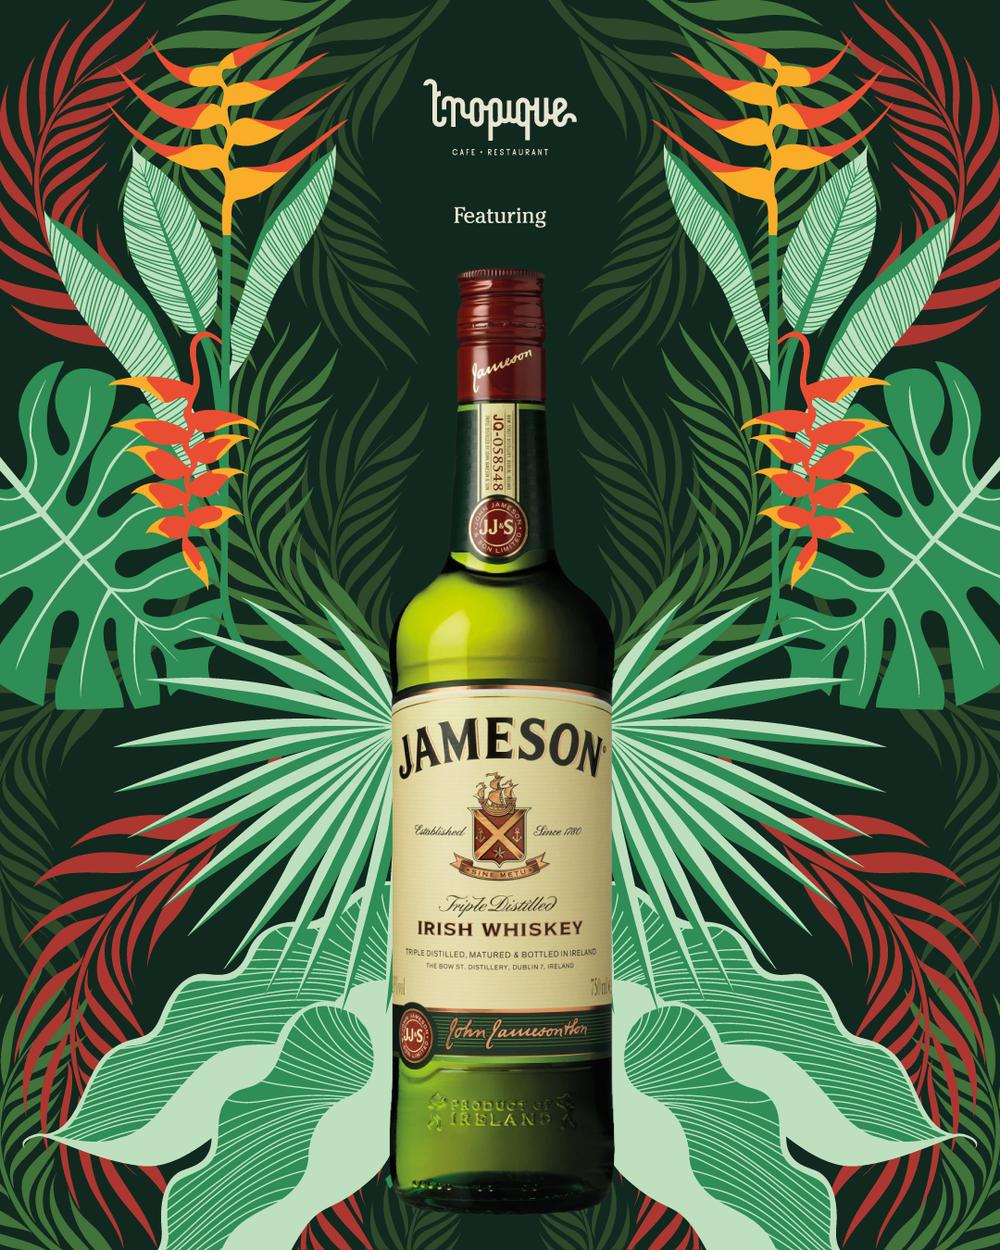 Tropique-cafe-and-restaurant_Jameson-Irish-whiskey_edit.png